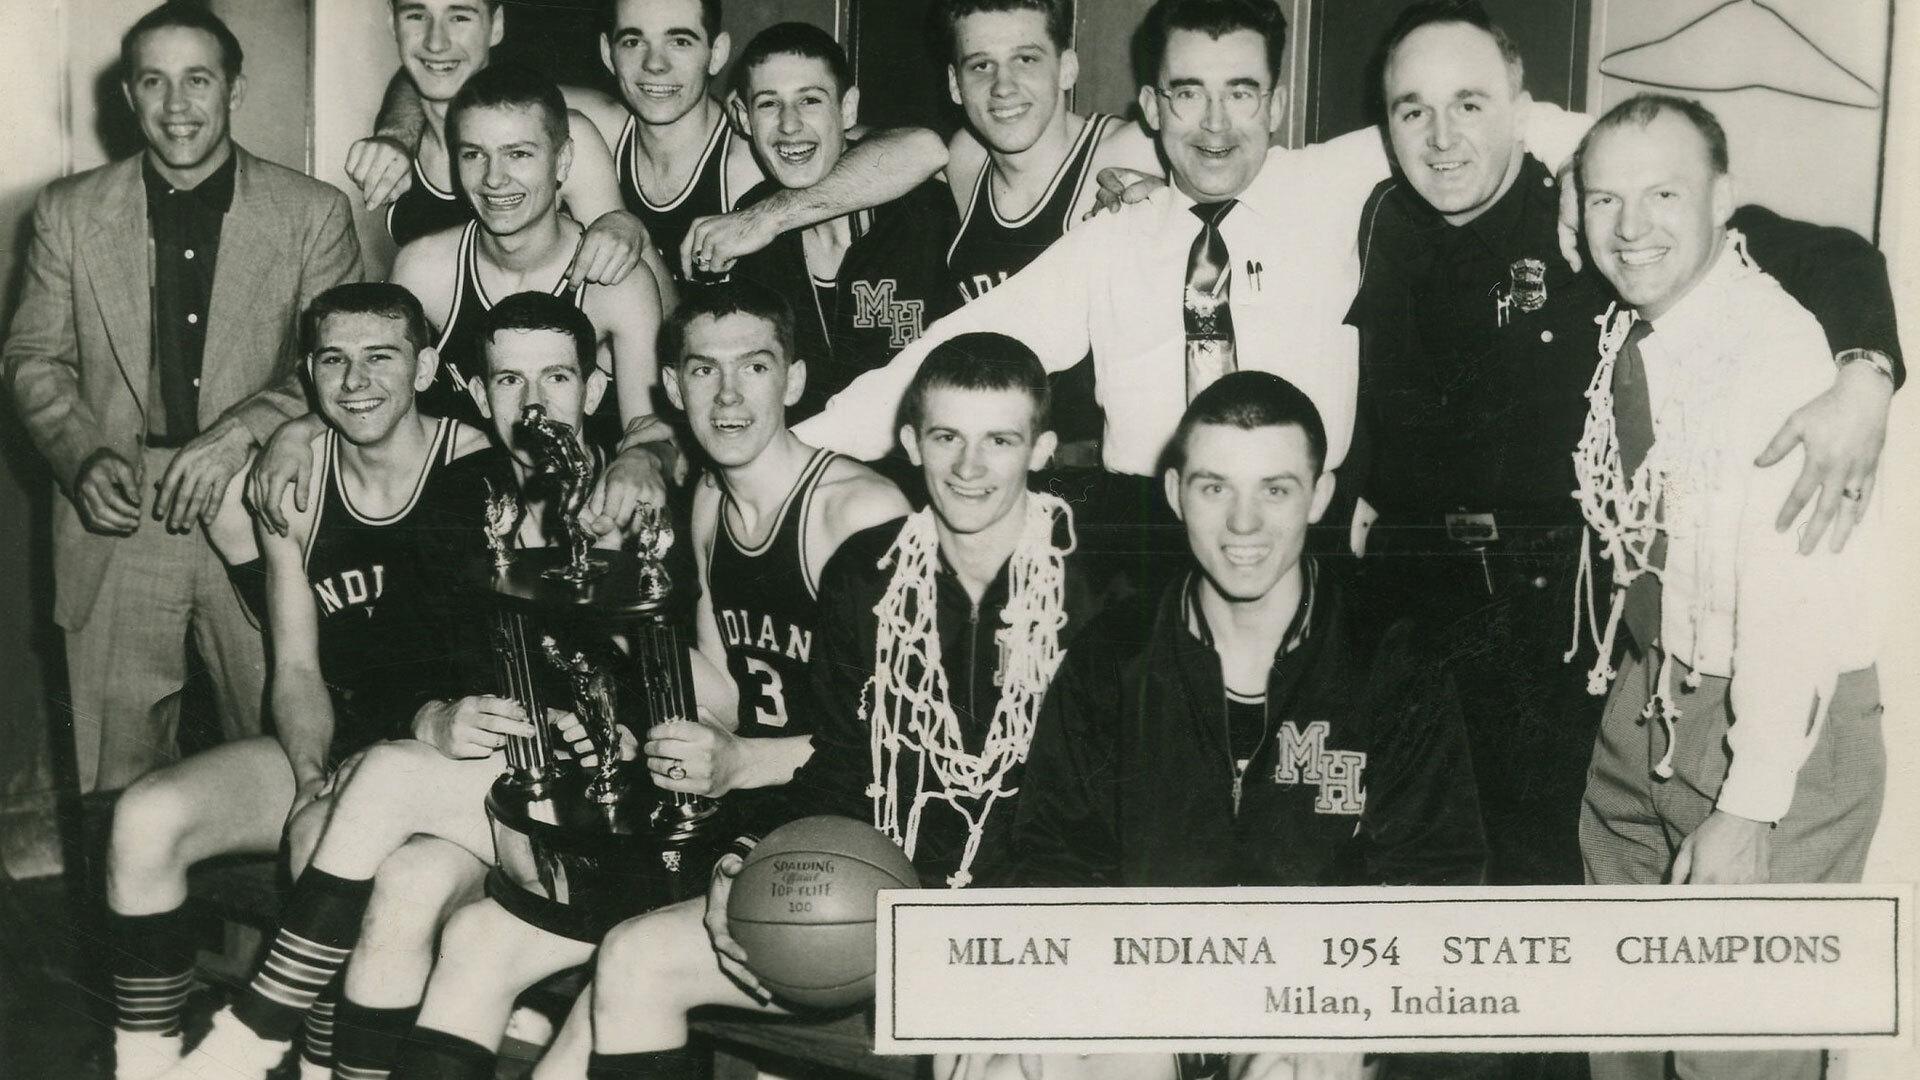 Milan High School championship basketball team